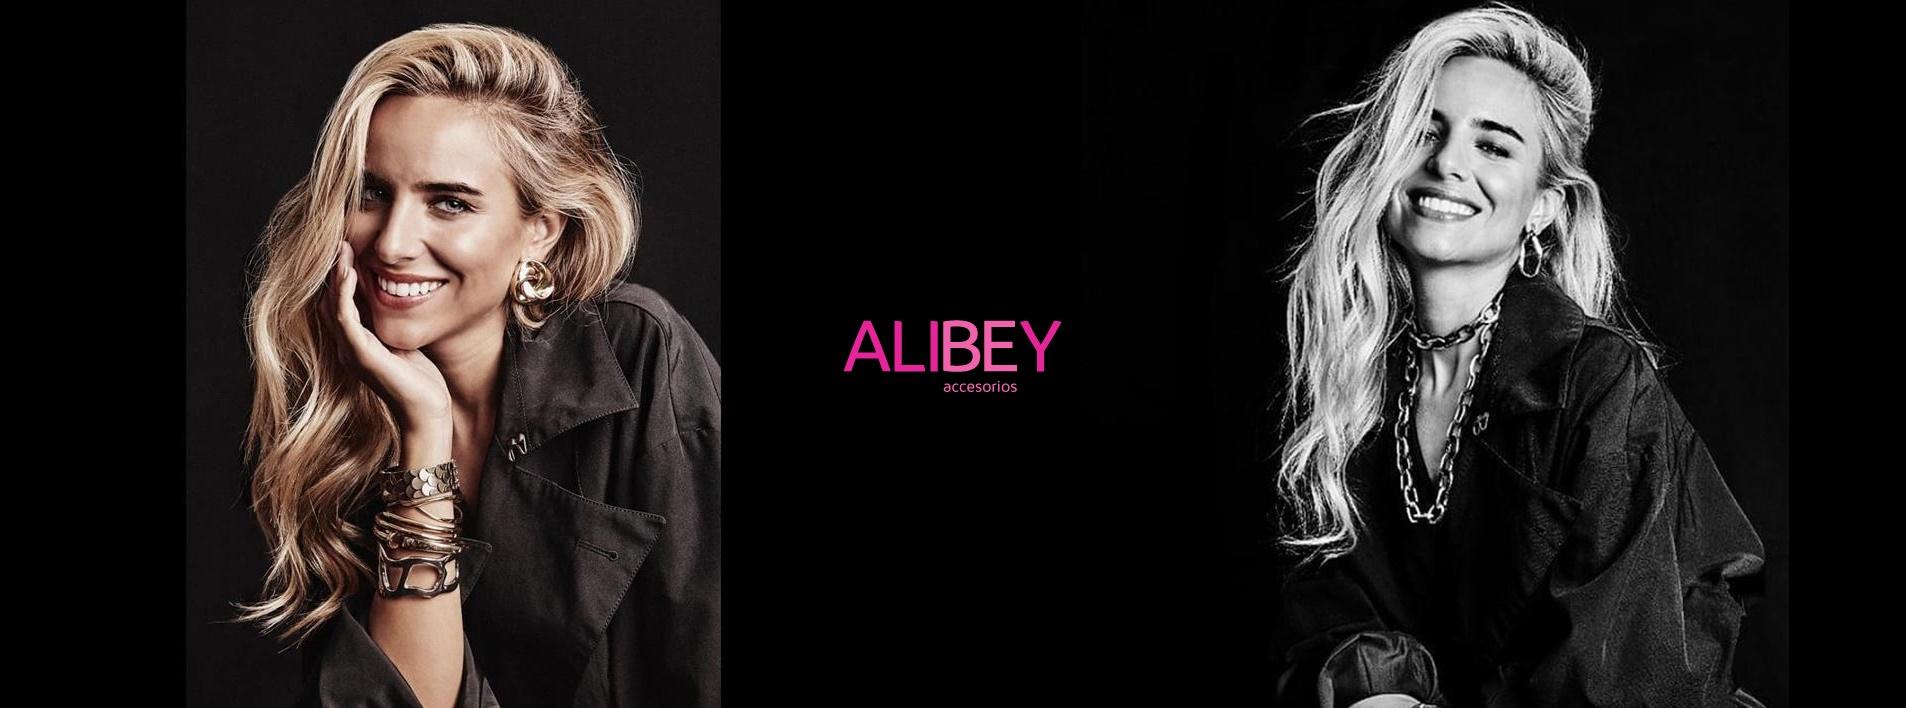 alibey-banner